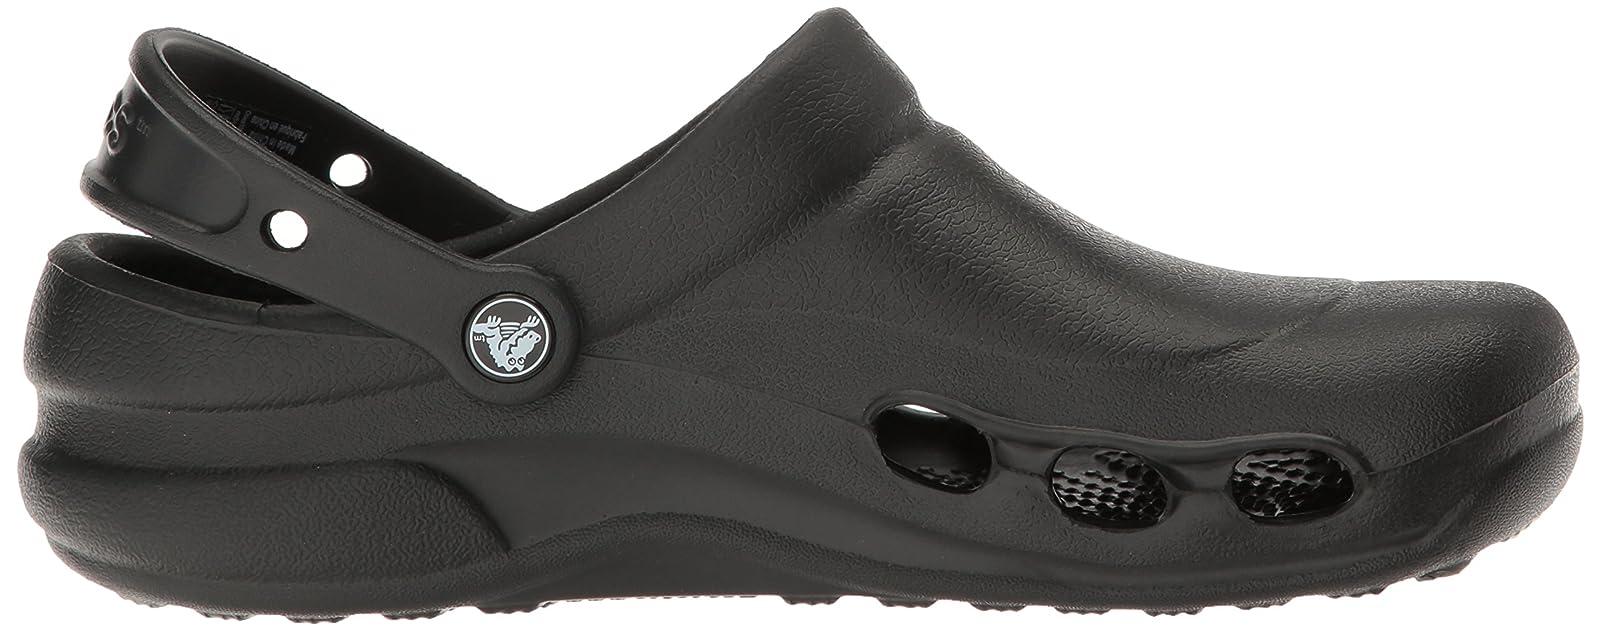 Crocs Unisex Specialist Vent Clog Black 11 10074M Black - 11